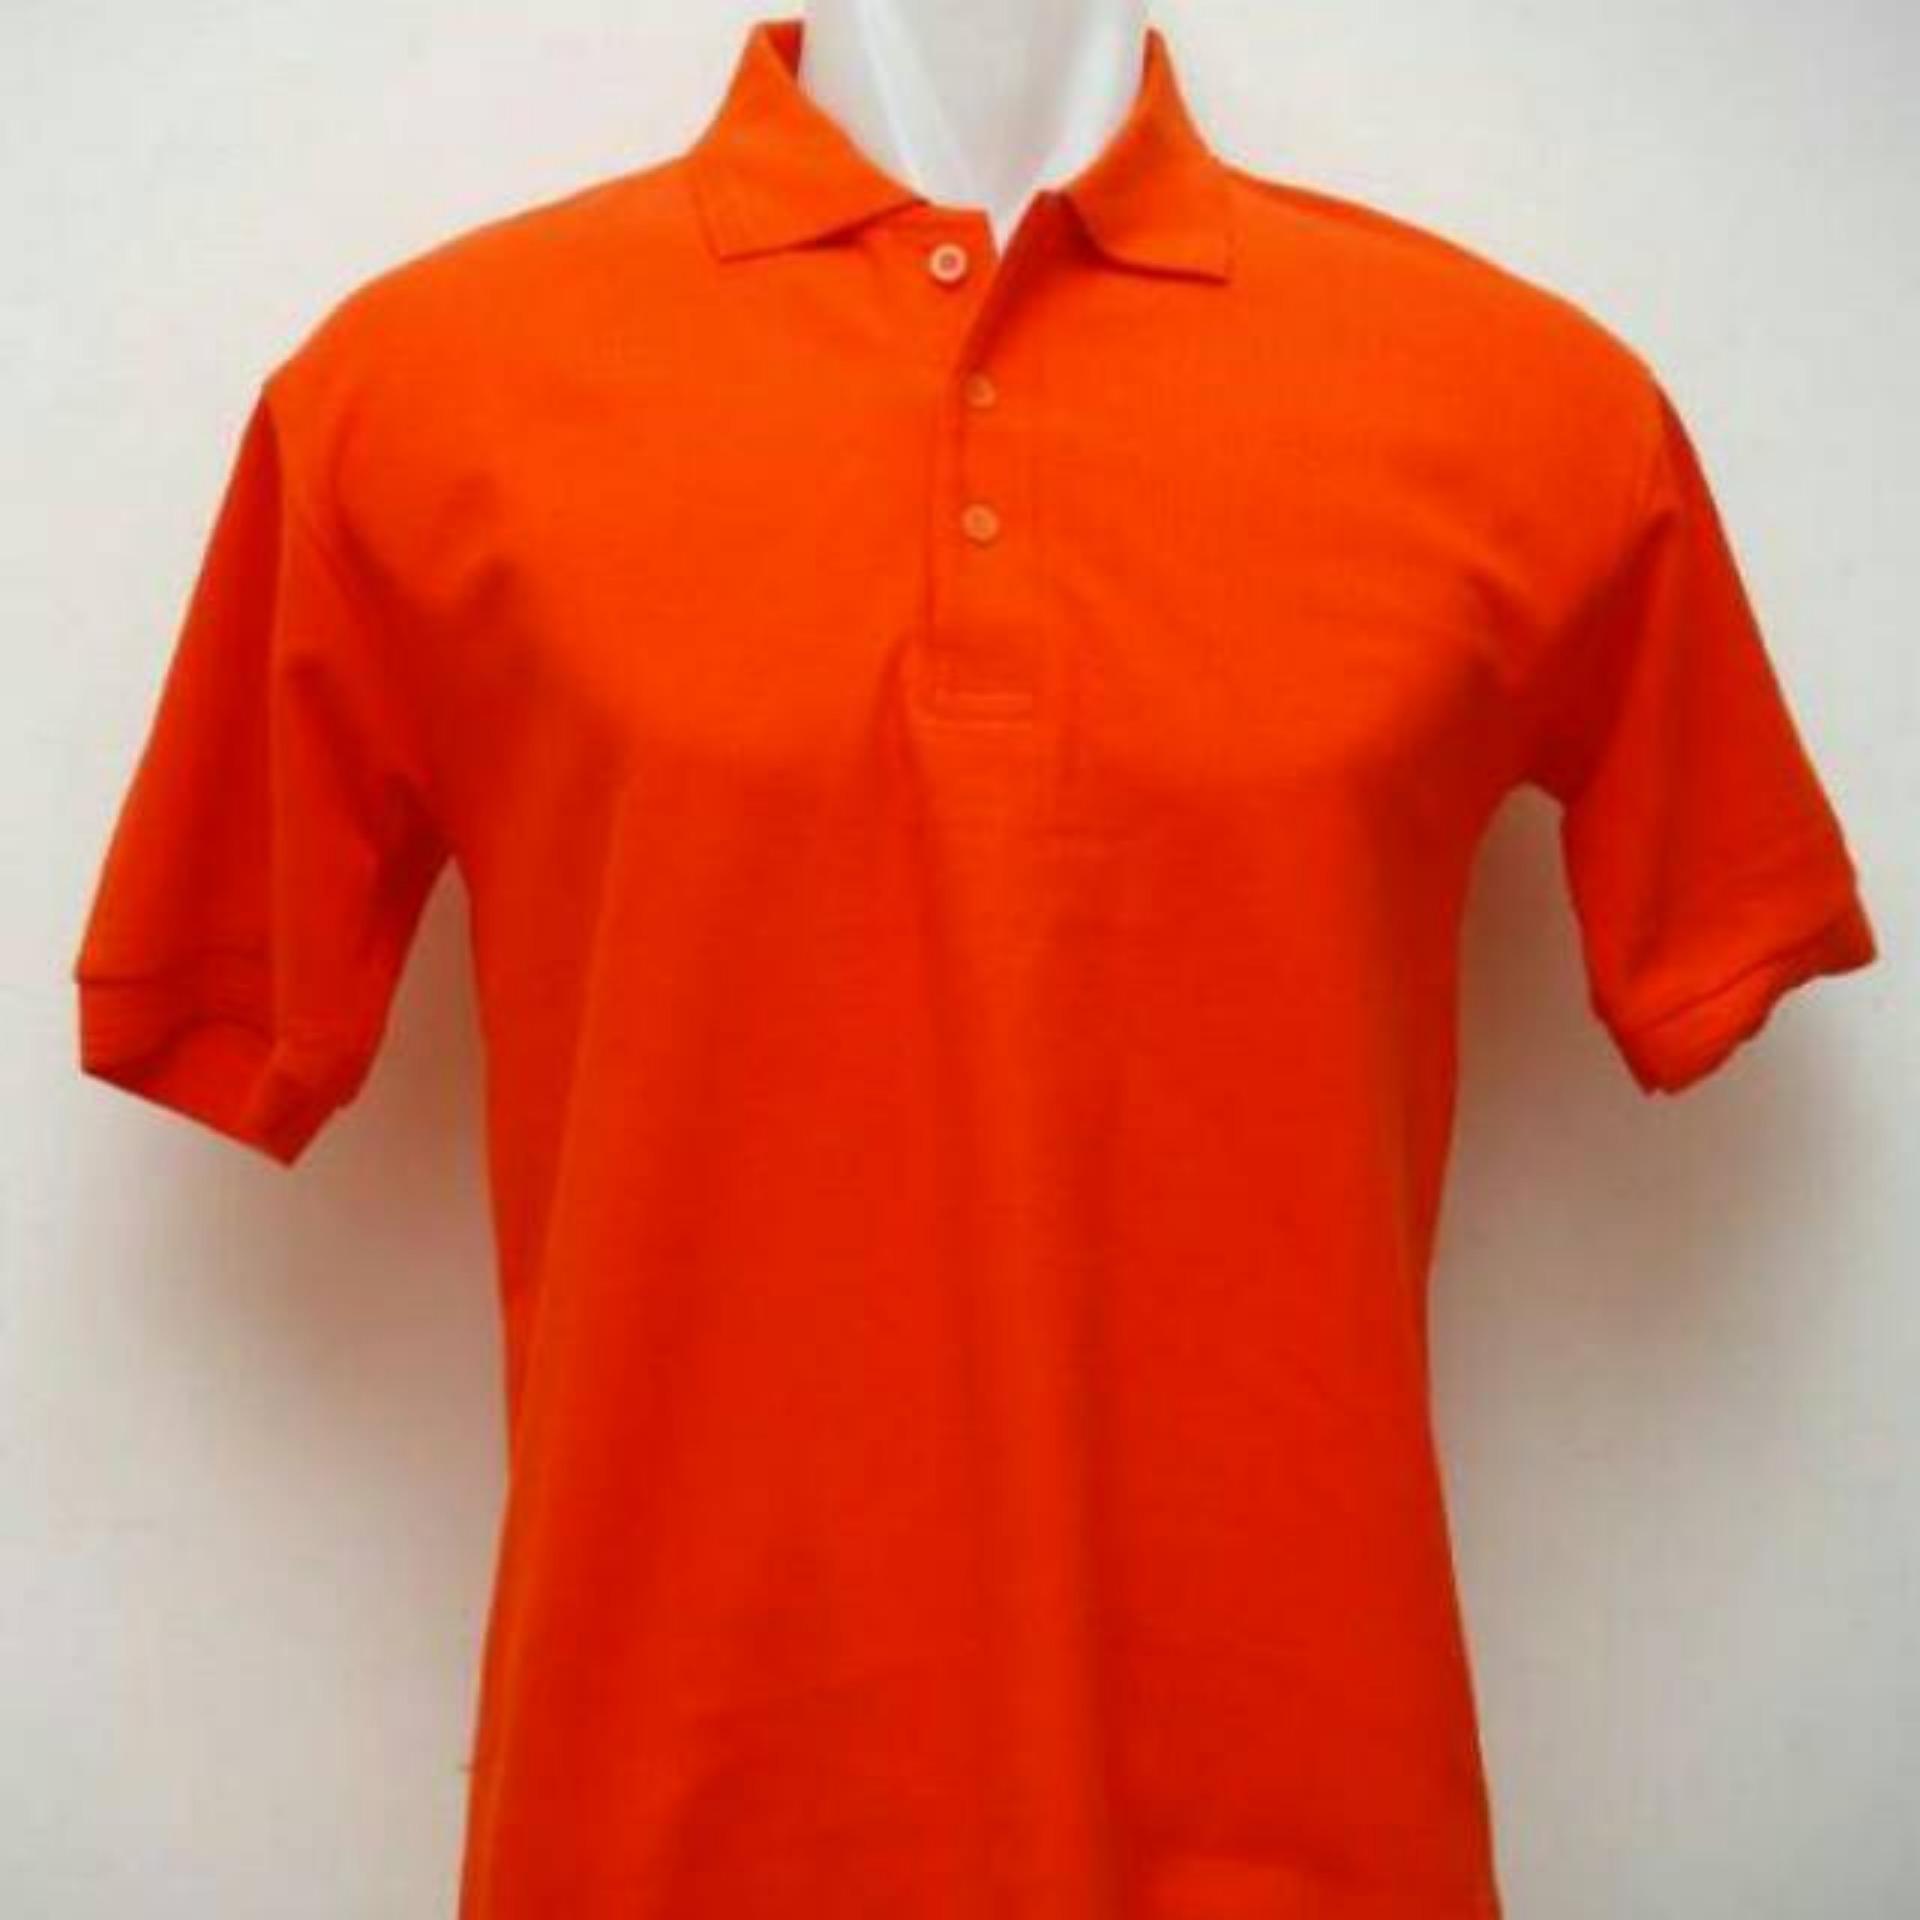 Kaos kerah murah / polo shirt / polo shirt orange / banyak warna / berkerah / cowok cewek / baju polo polos / grosir kaos / kaos murah / Orange